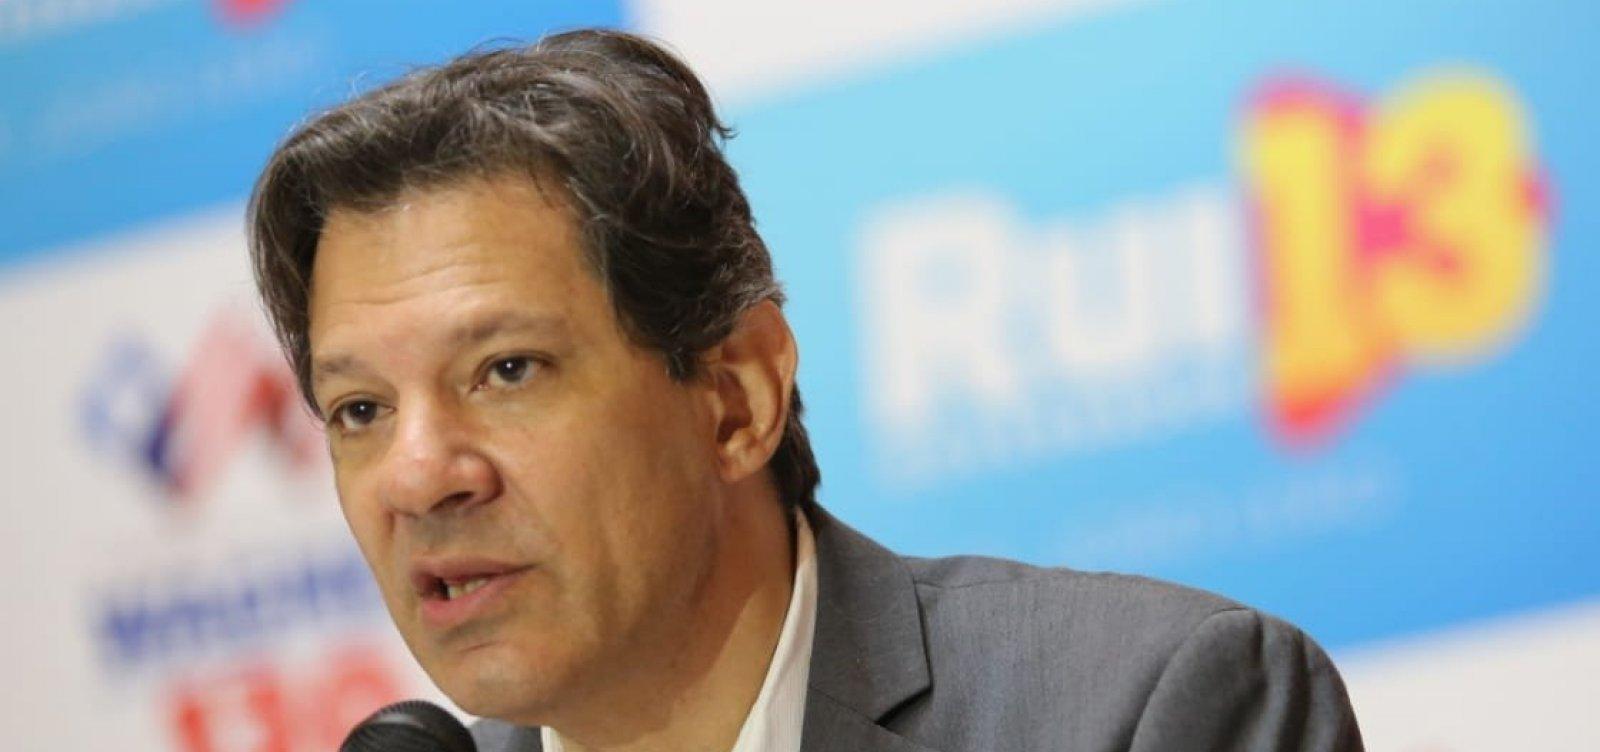 PT denuncia no TSE Fake News contra Haddad